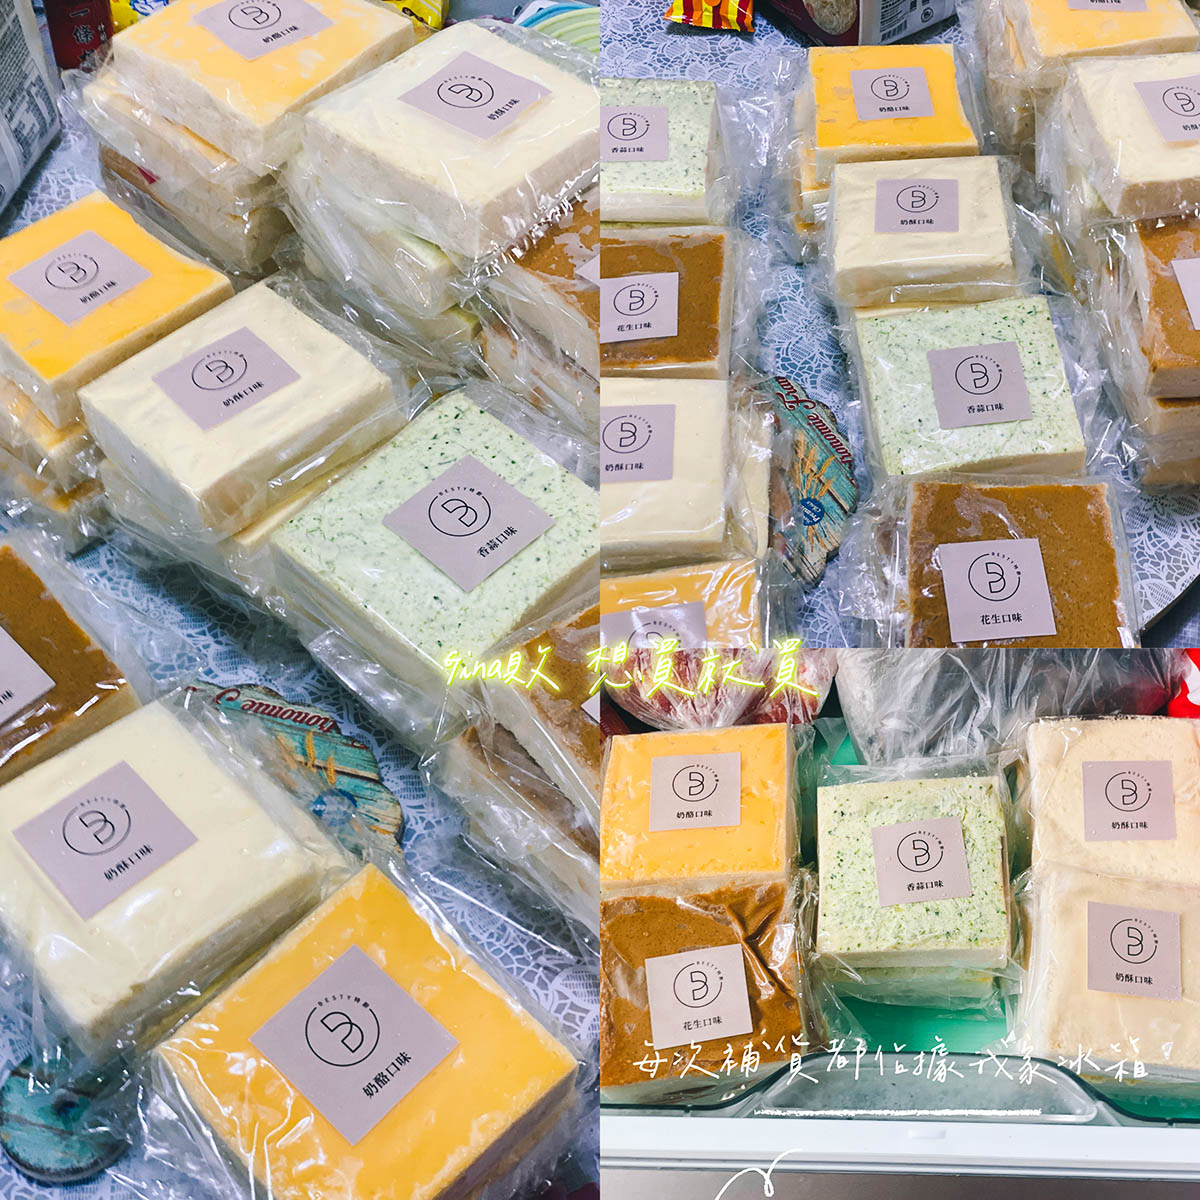 【Besty特廚2021團購】厚片吐司-香蒜、奶酥、奶酪、花生、巧克力、焦糖奶酪、海苔起司、香蔥奶油-共8種口味 @GINA環球旅行生活